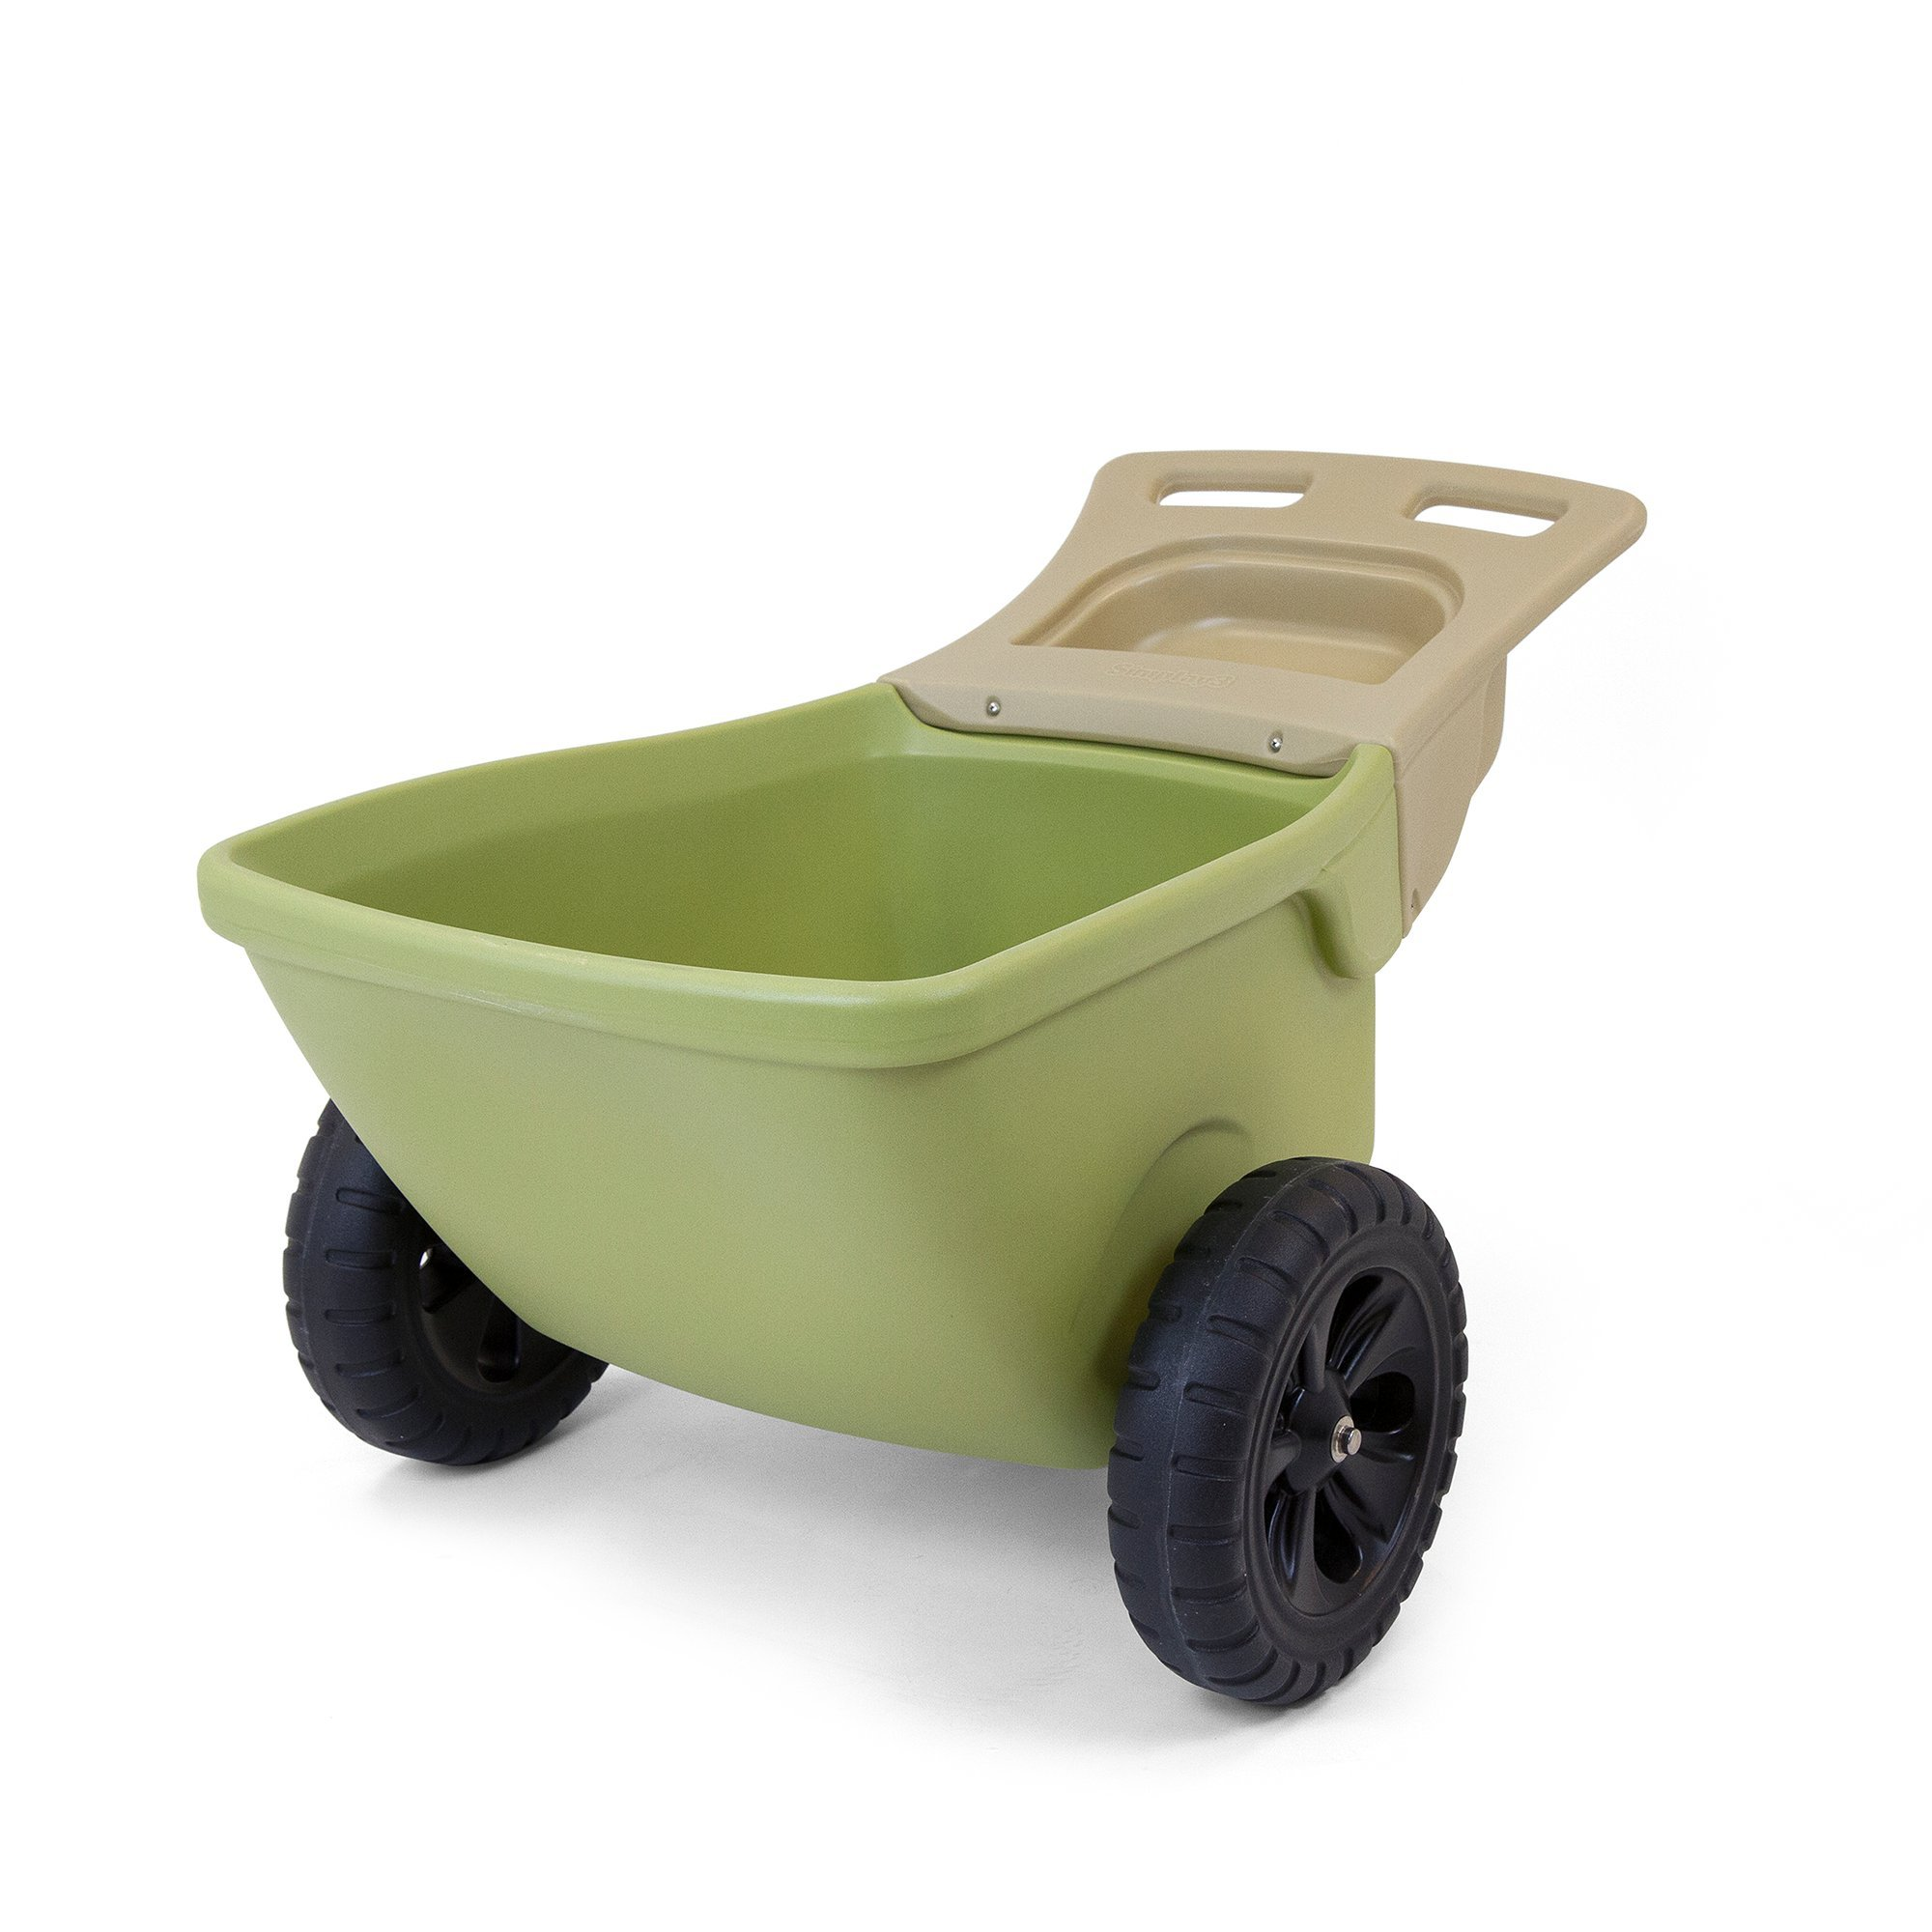 Simplay3 Easy Haul Plastic Wheelbarrow w/Garden Tool Storage Tray, 4 cubic ft. Capacity